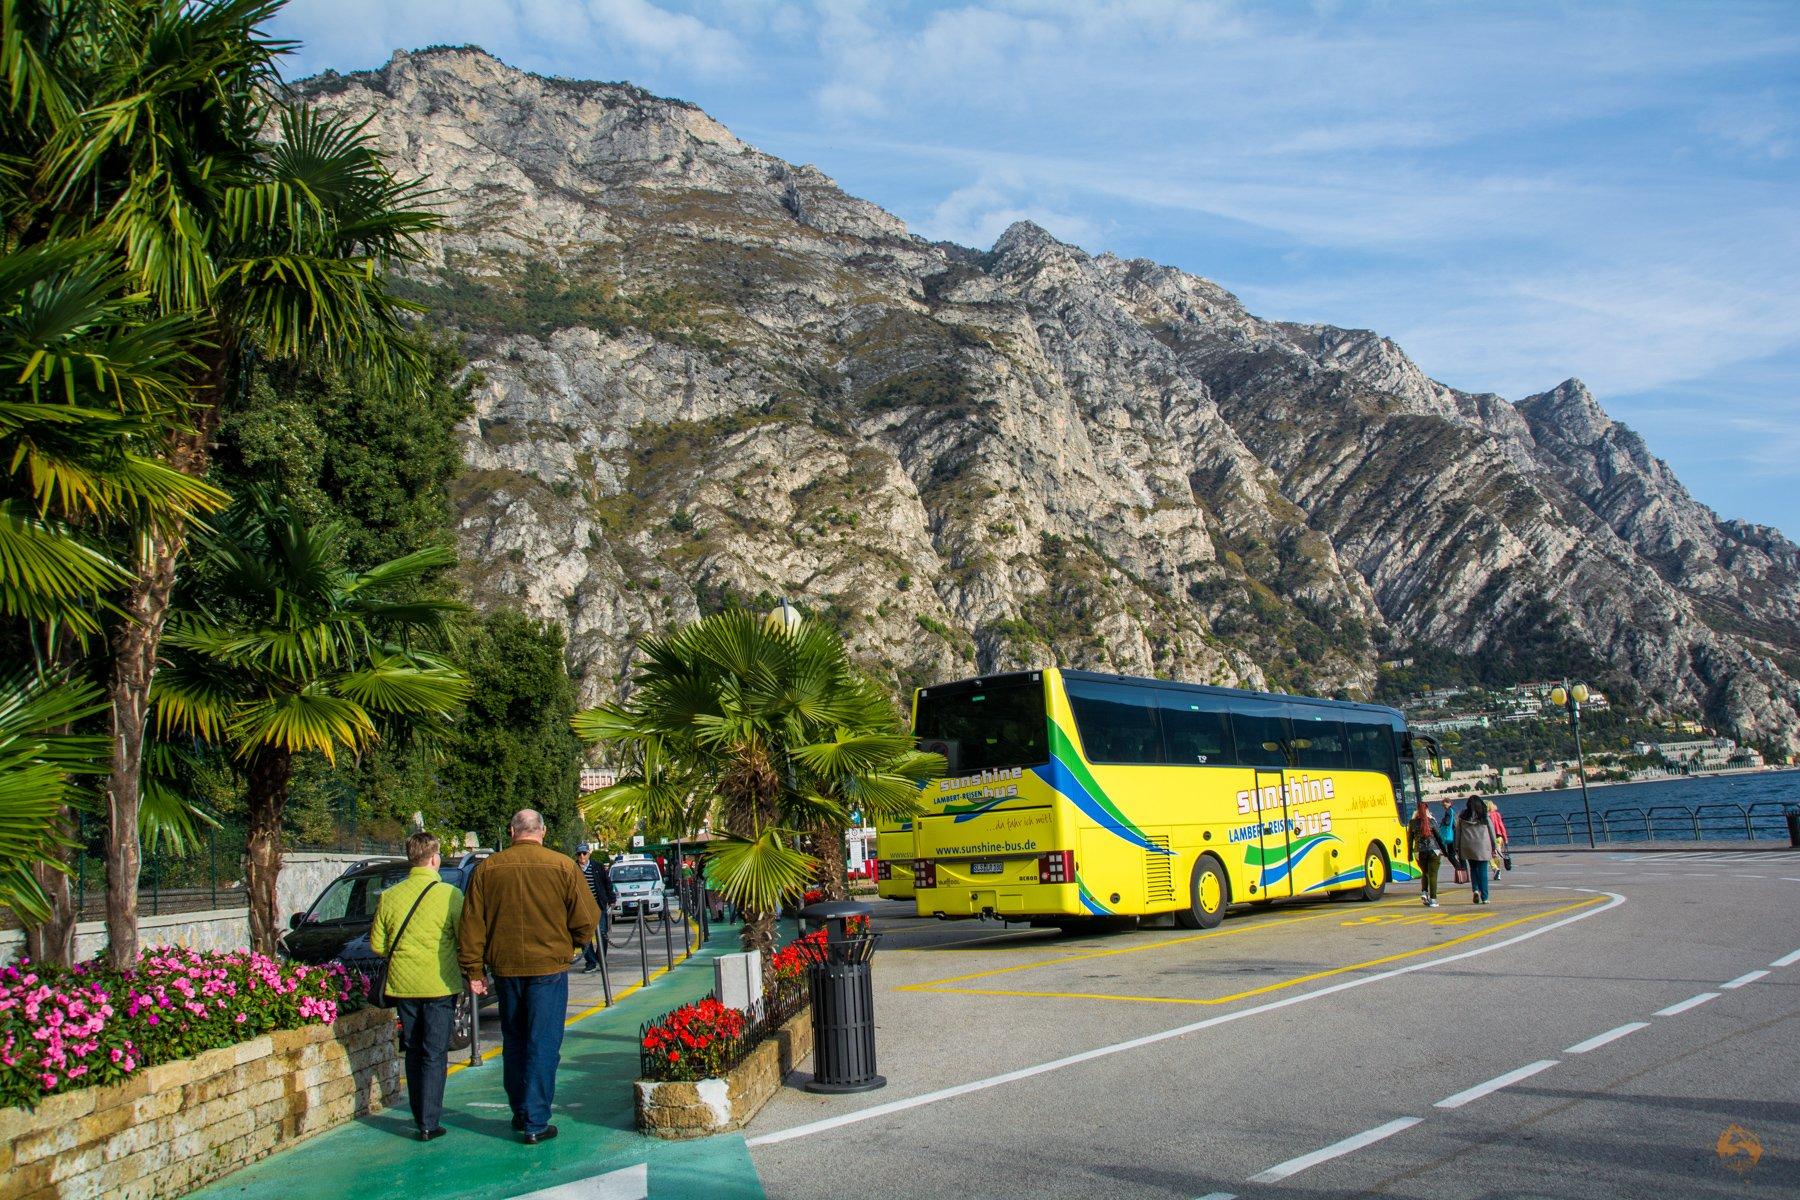 Sunshine Bus - Lambert Reisen - Limone - Gardasee